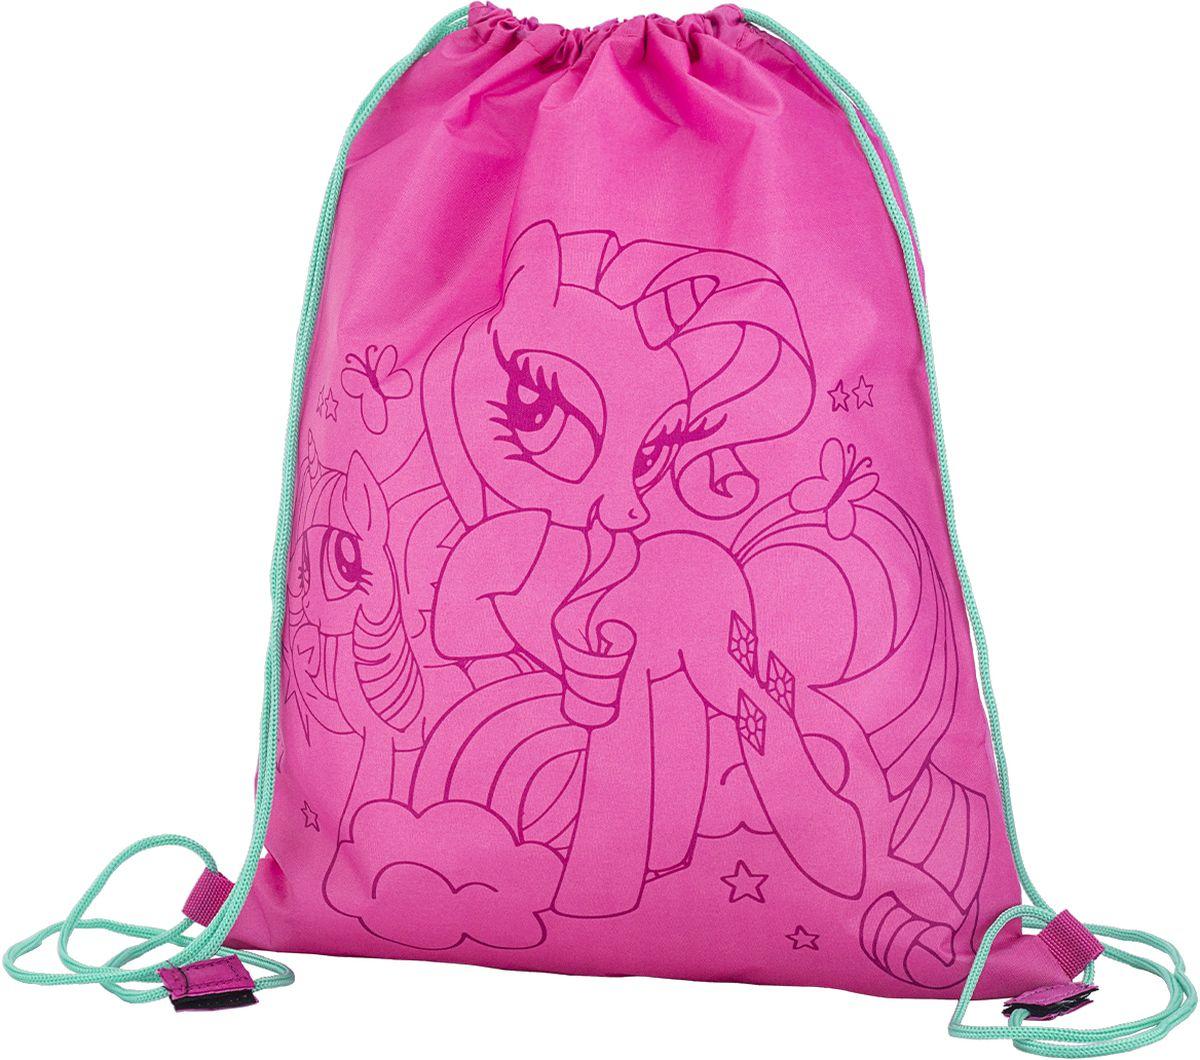 My Little Pony Сумка для сменной обуви MPEB-MT2-883 transformers сумка для сменной обуви prime treb mt2 883